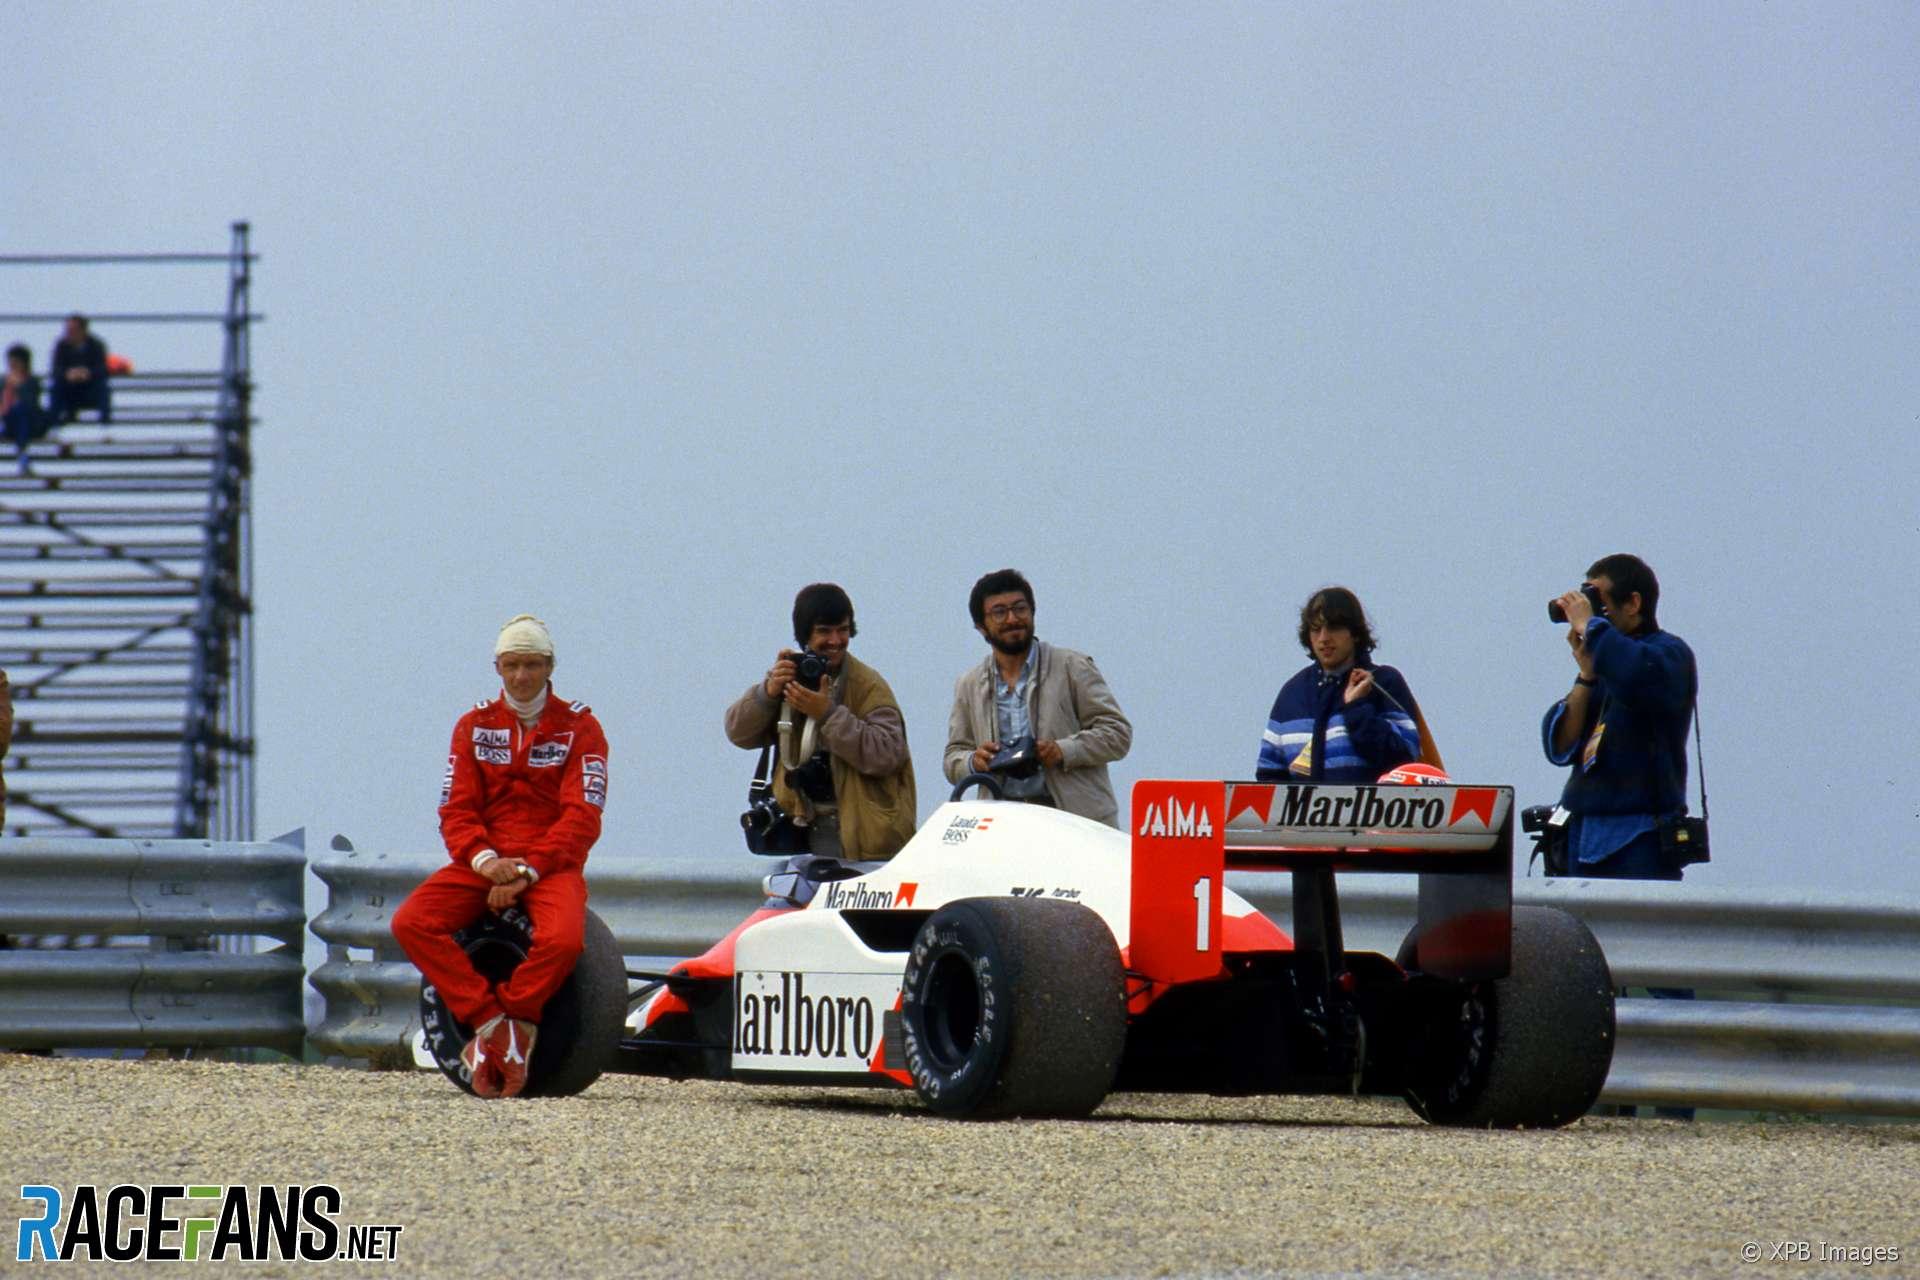 Niki Lauda, McLaren, Estoril, 1985